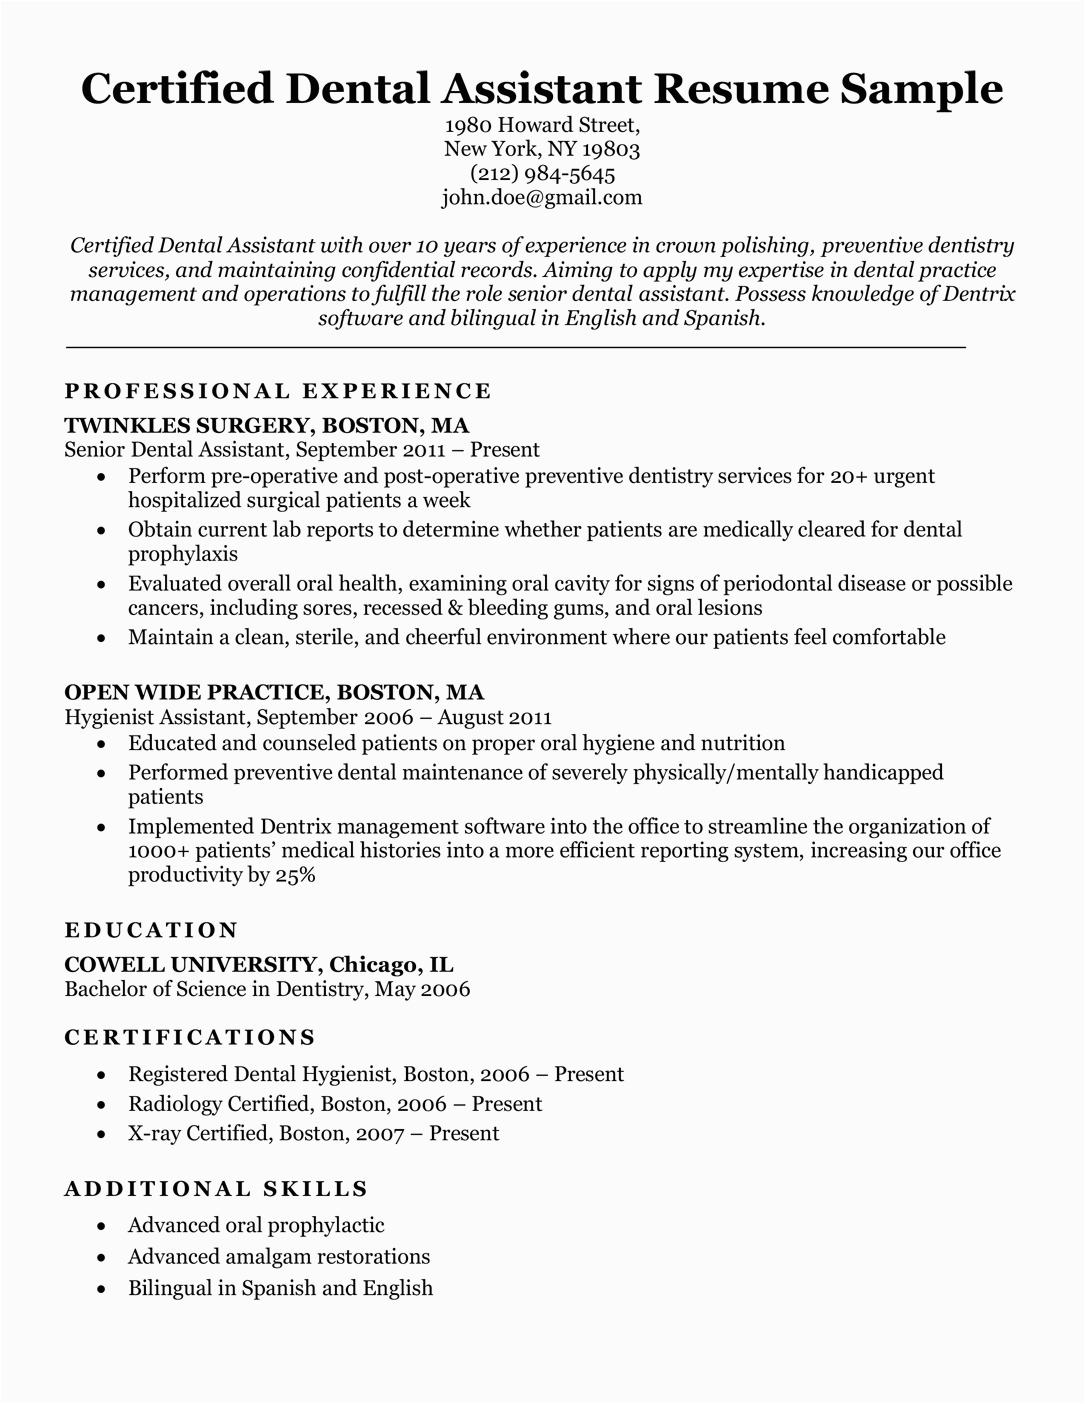 Sample Of Resume for Dental assistant Dental Resume Examples & Writing Tips